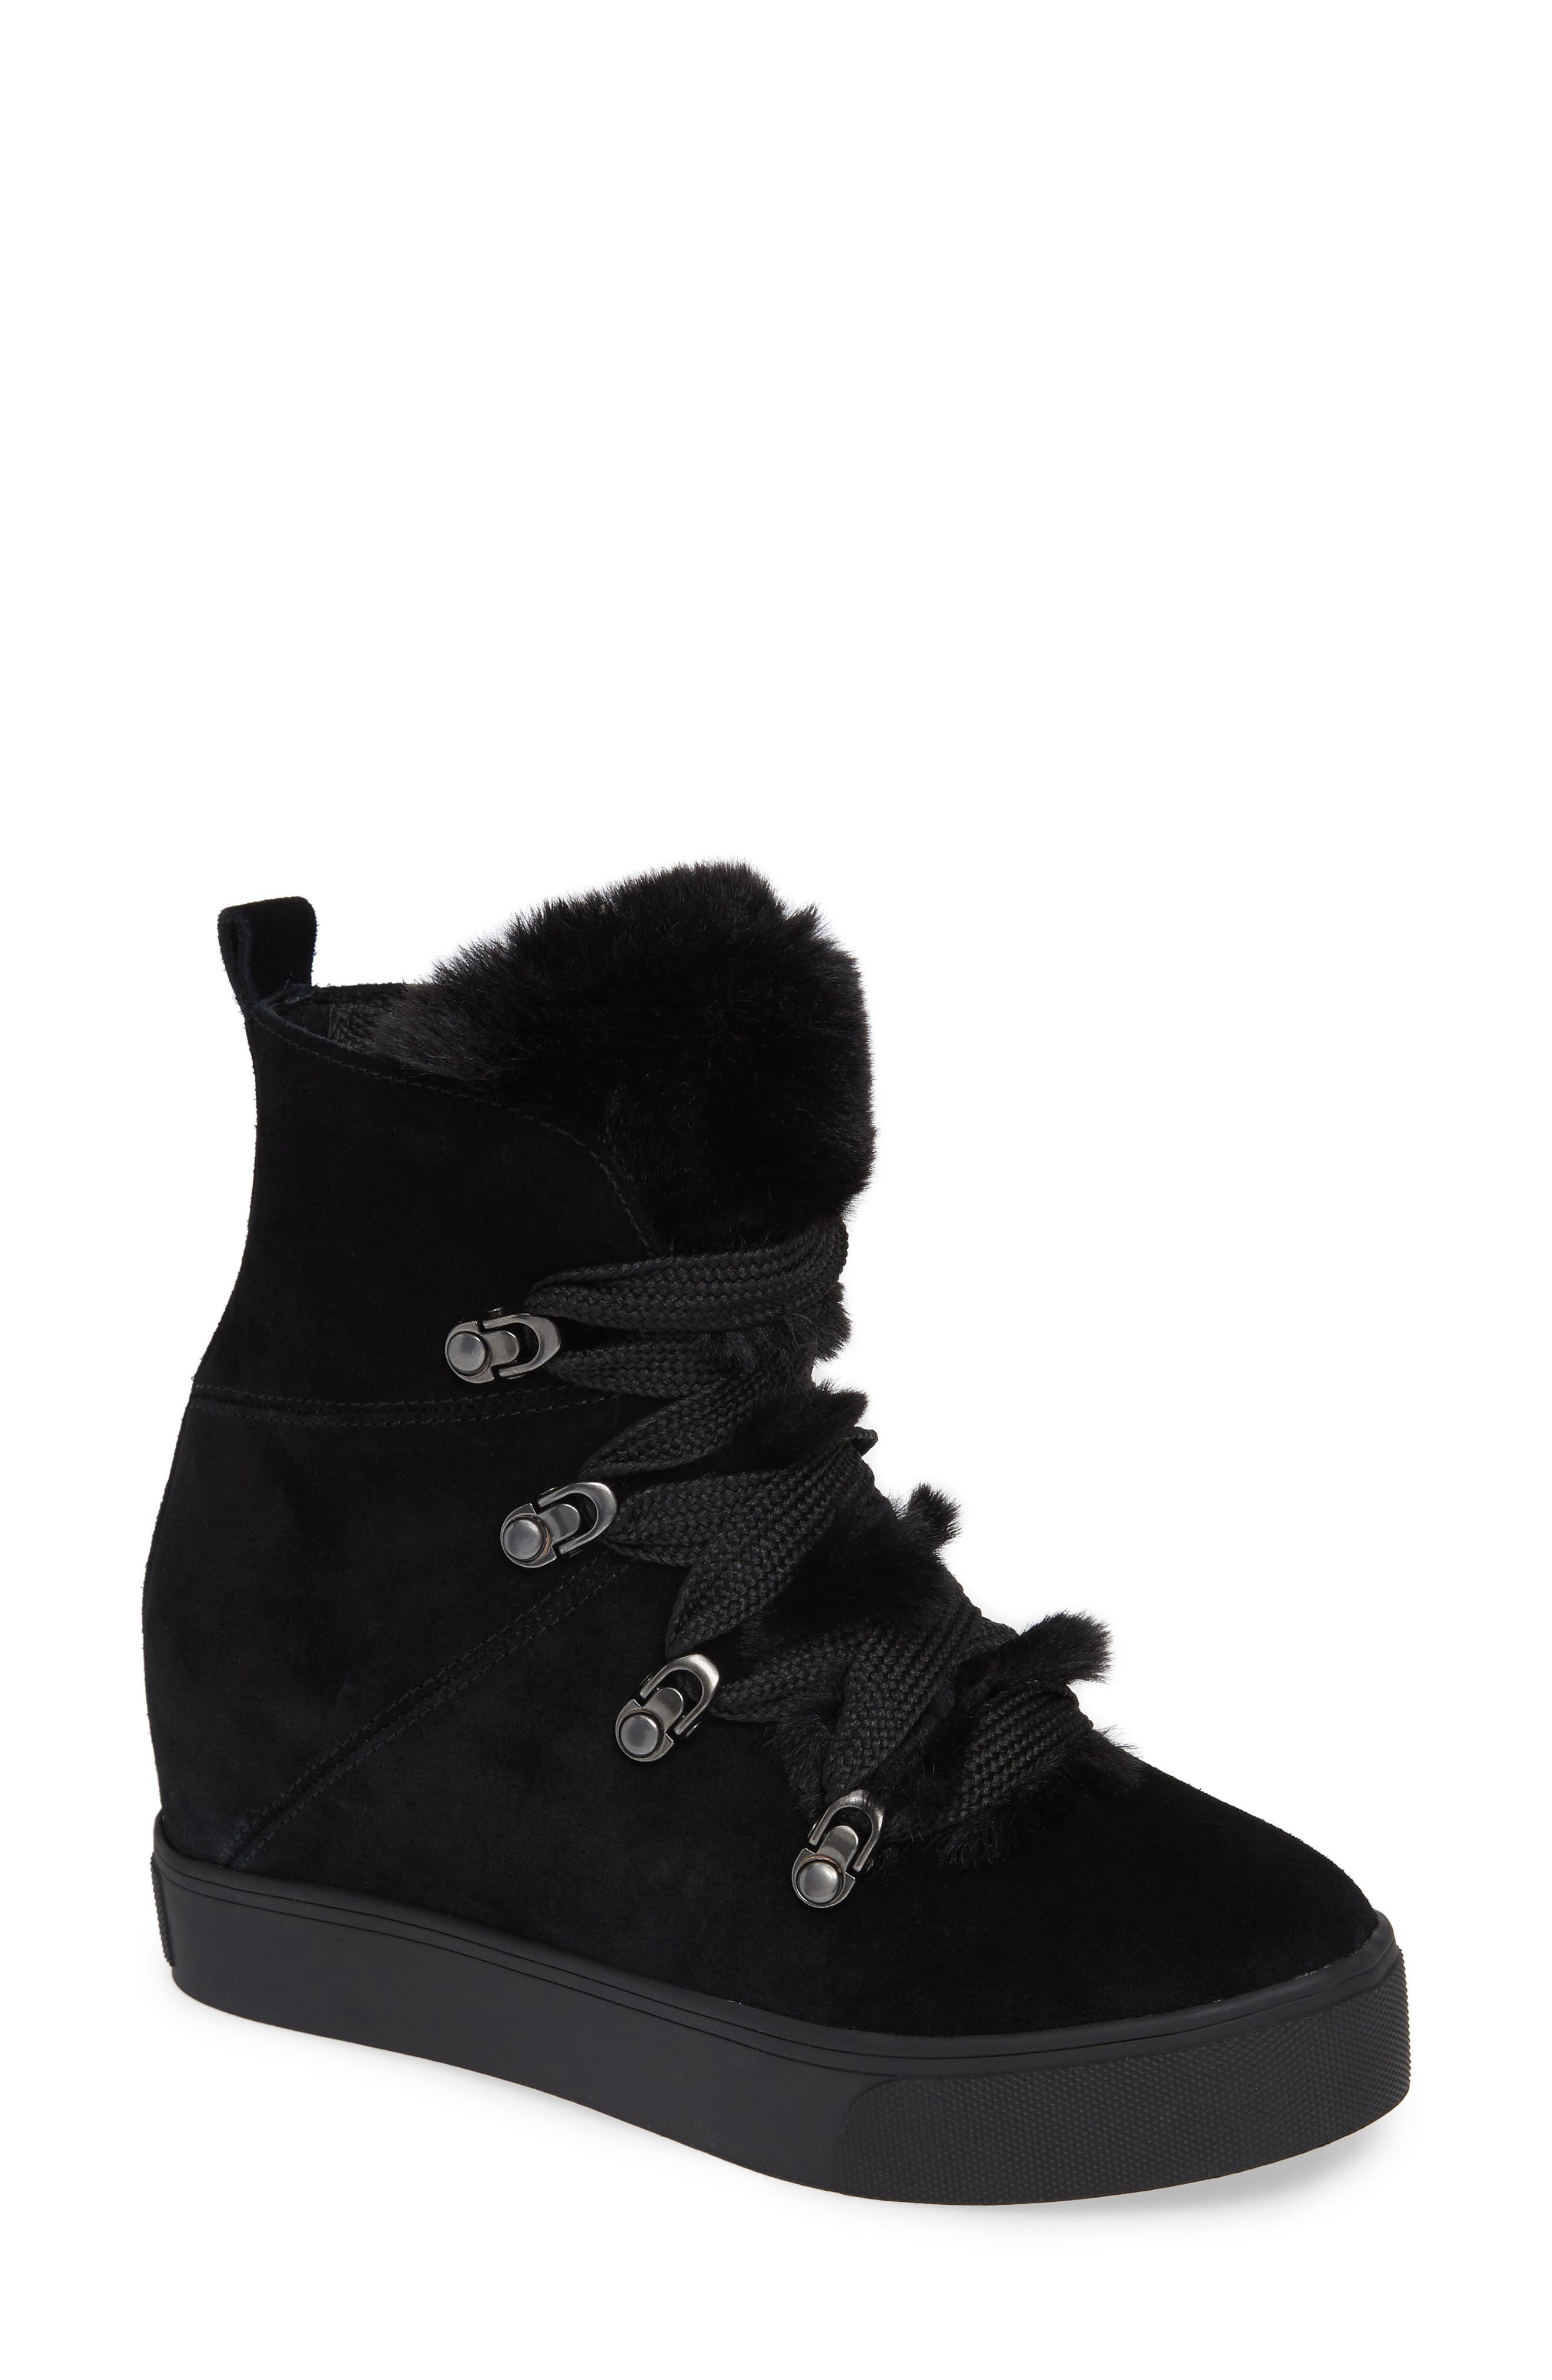 Whitney Faux Fur Trim High Top Sneaker,                             Main thumbnail 1, color,                             BLACK SUEDE